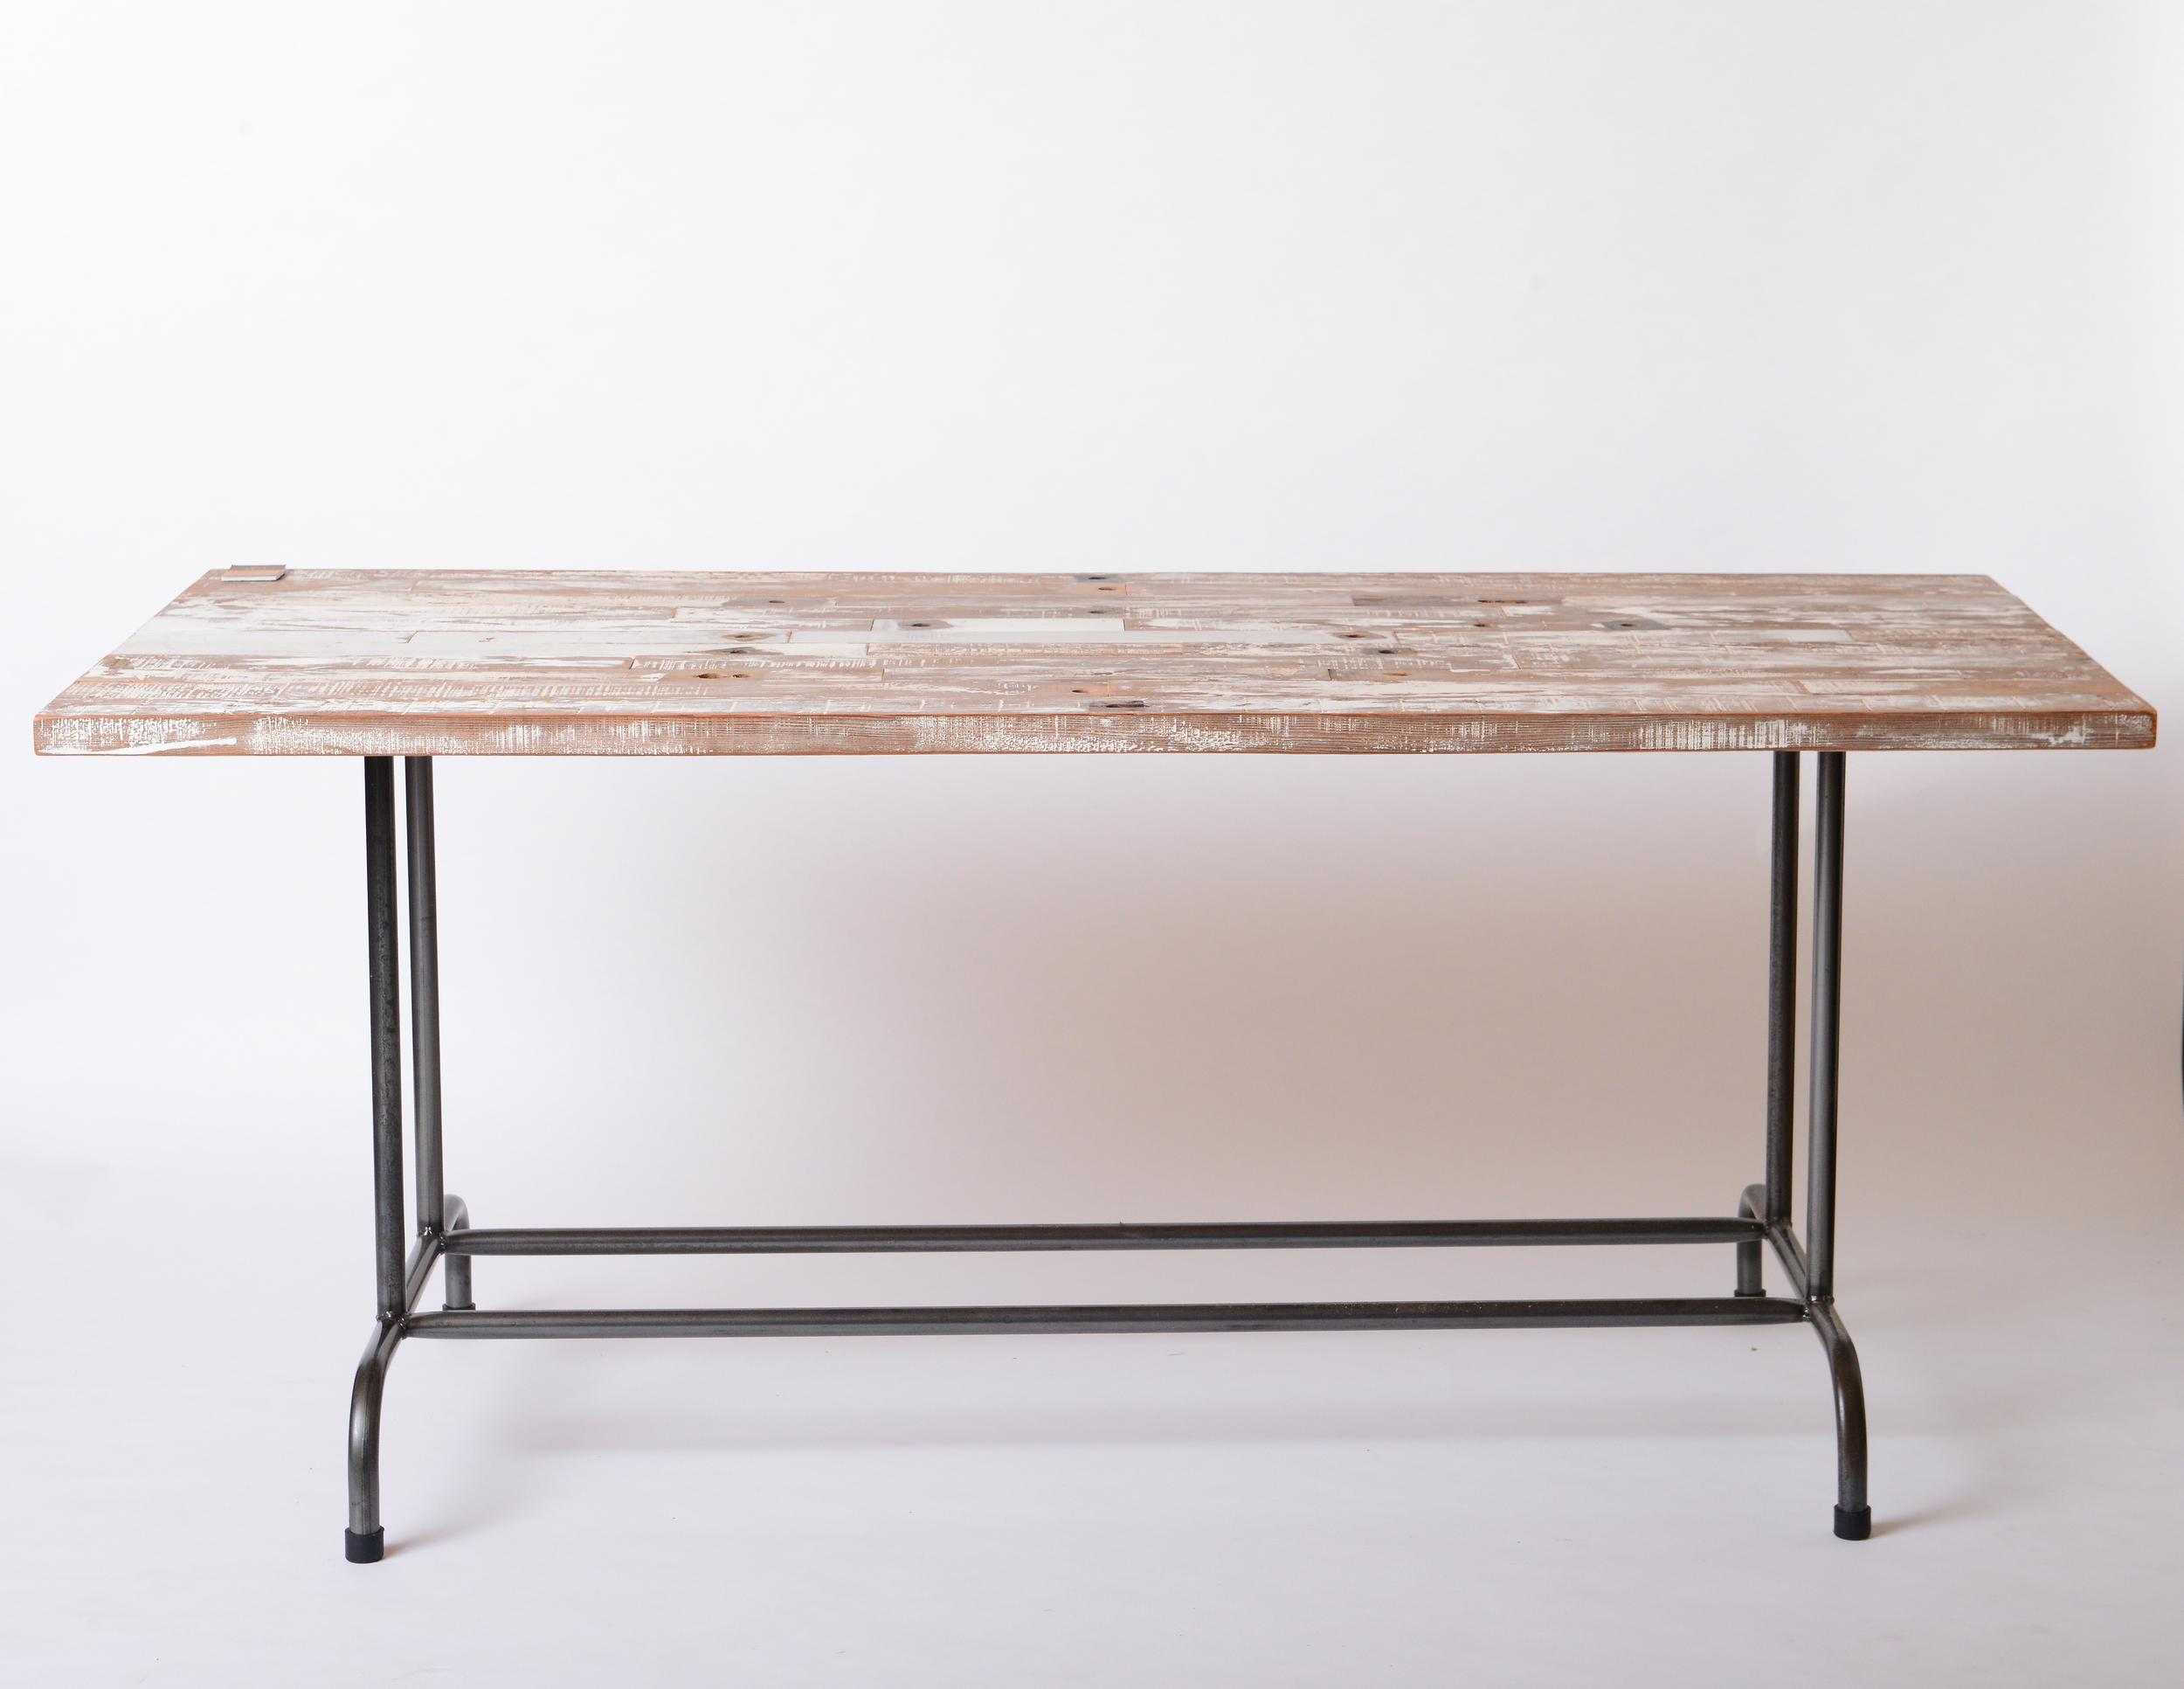 F-02 Laval dining table (BLACK) 栂木/台灣檜木  Size:L150~300xW80~90xH75cm  NT 26,000起 (未稅,運費另計)